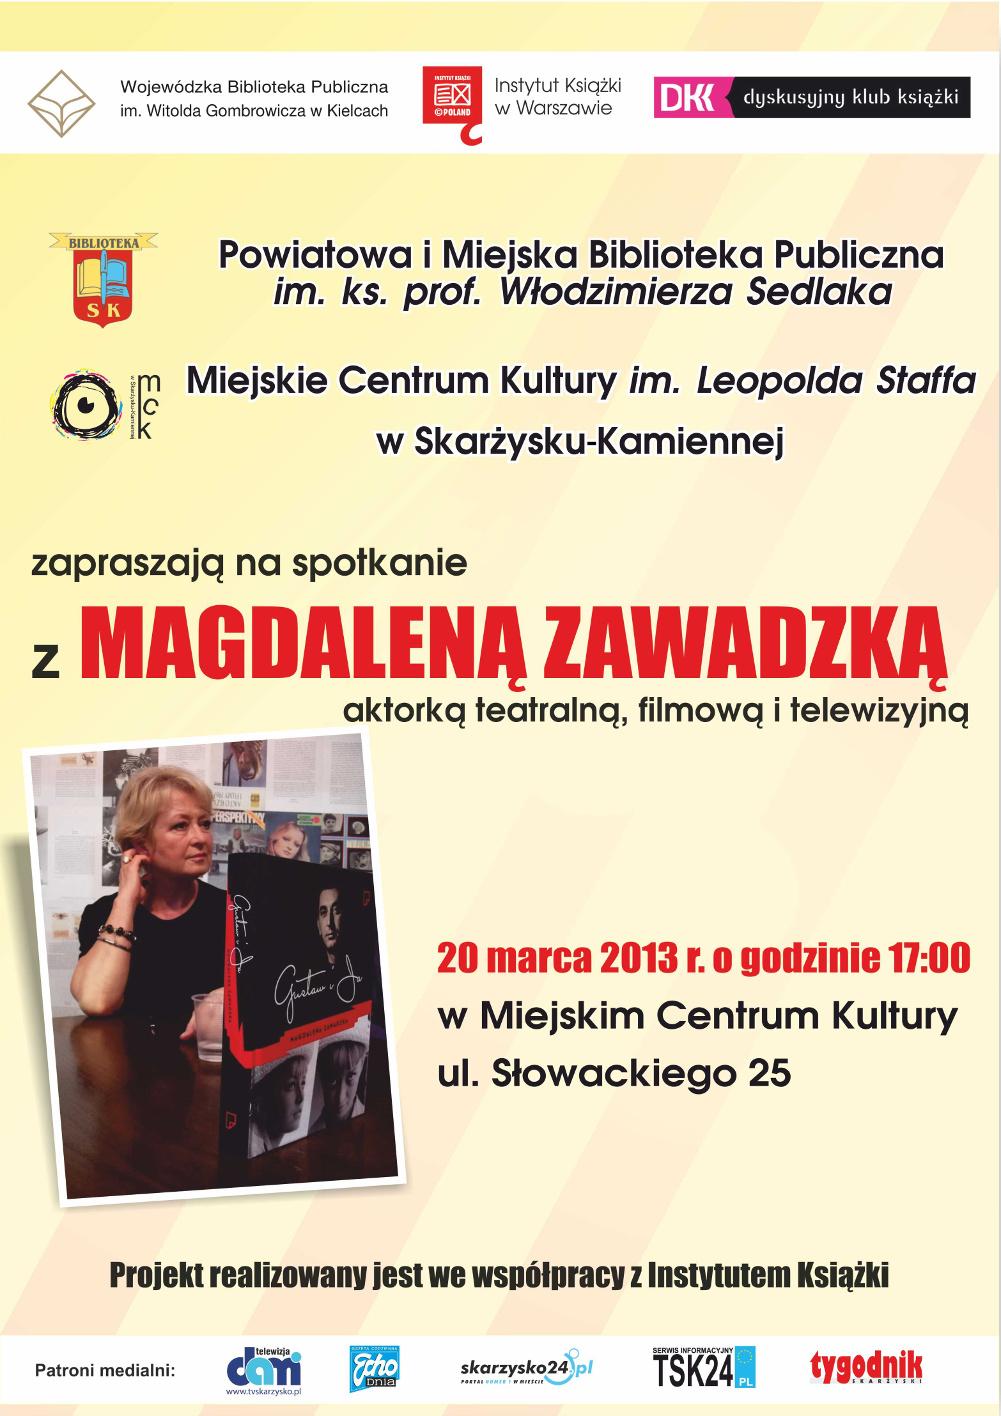 plakat-spotkanie-Magdalena-Zawadzka-m